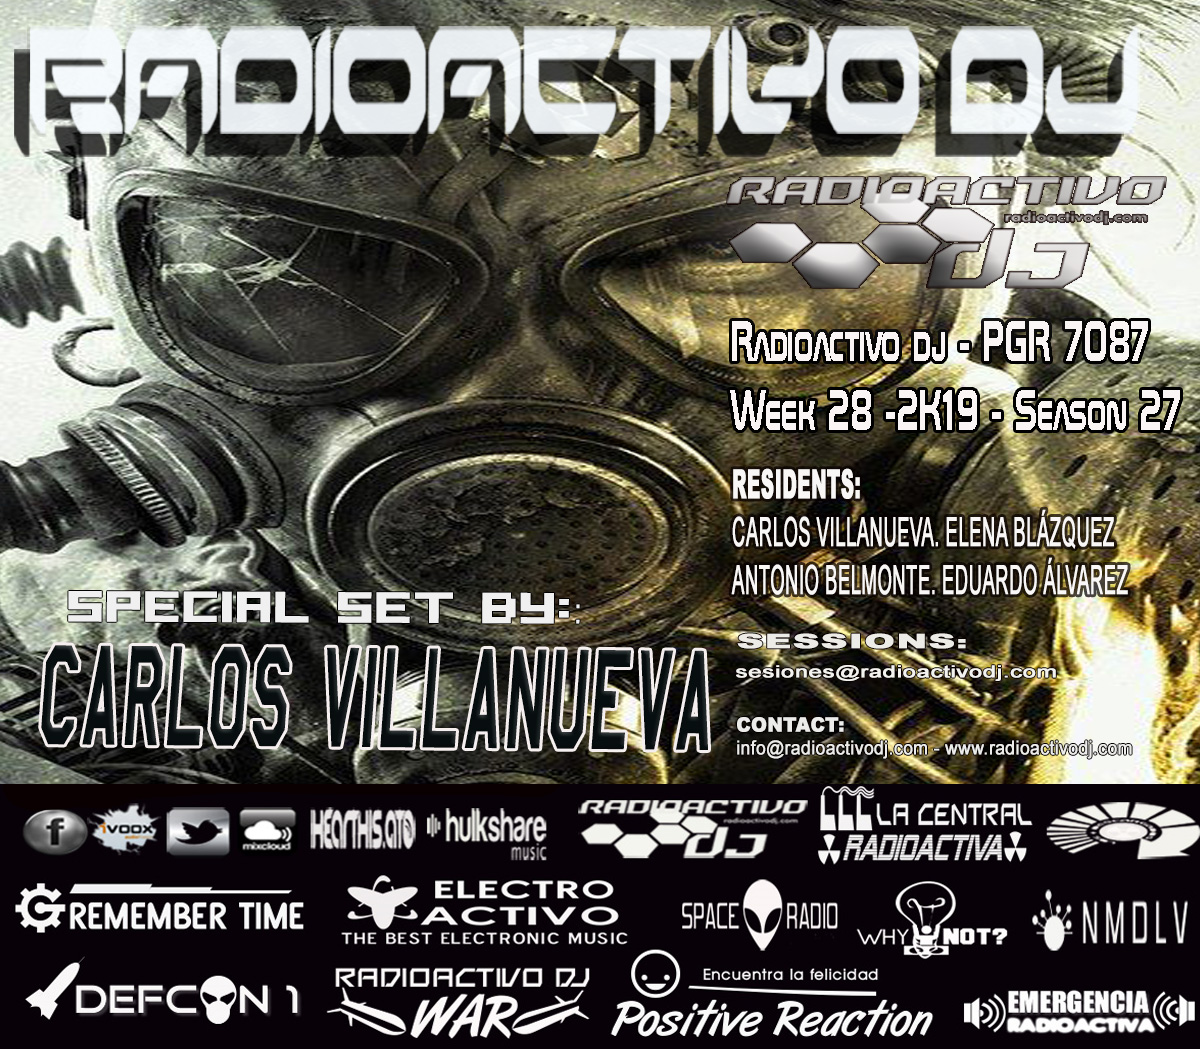 RADIOACTIVO-DJ-28-2019